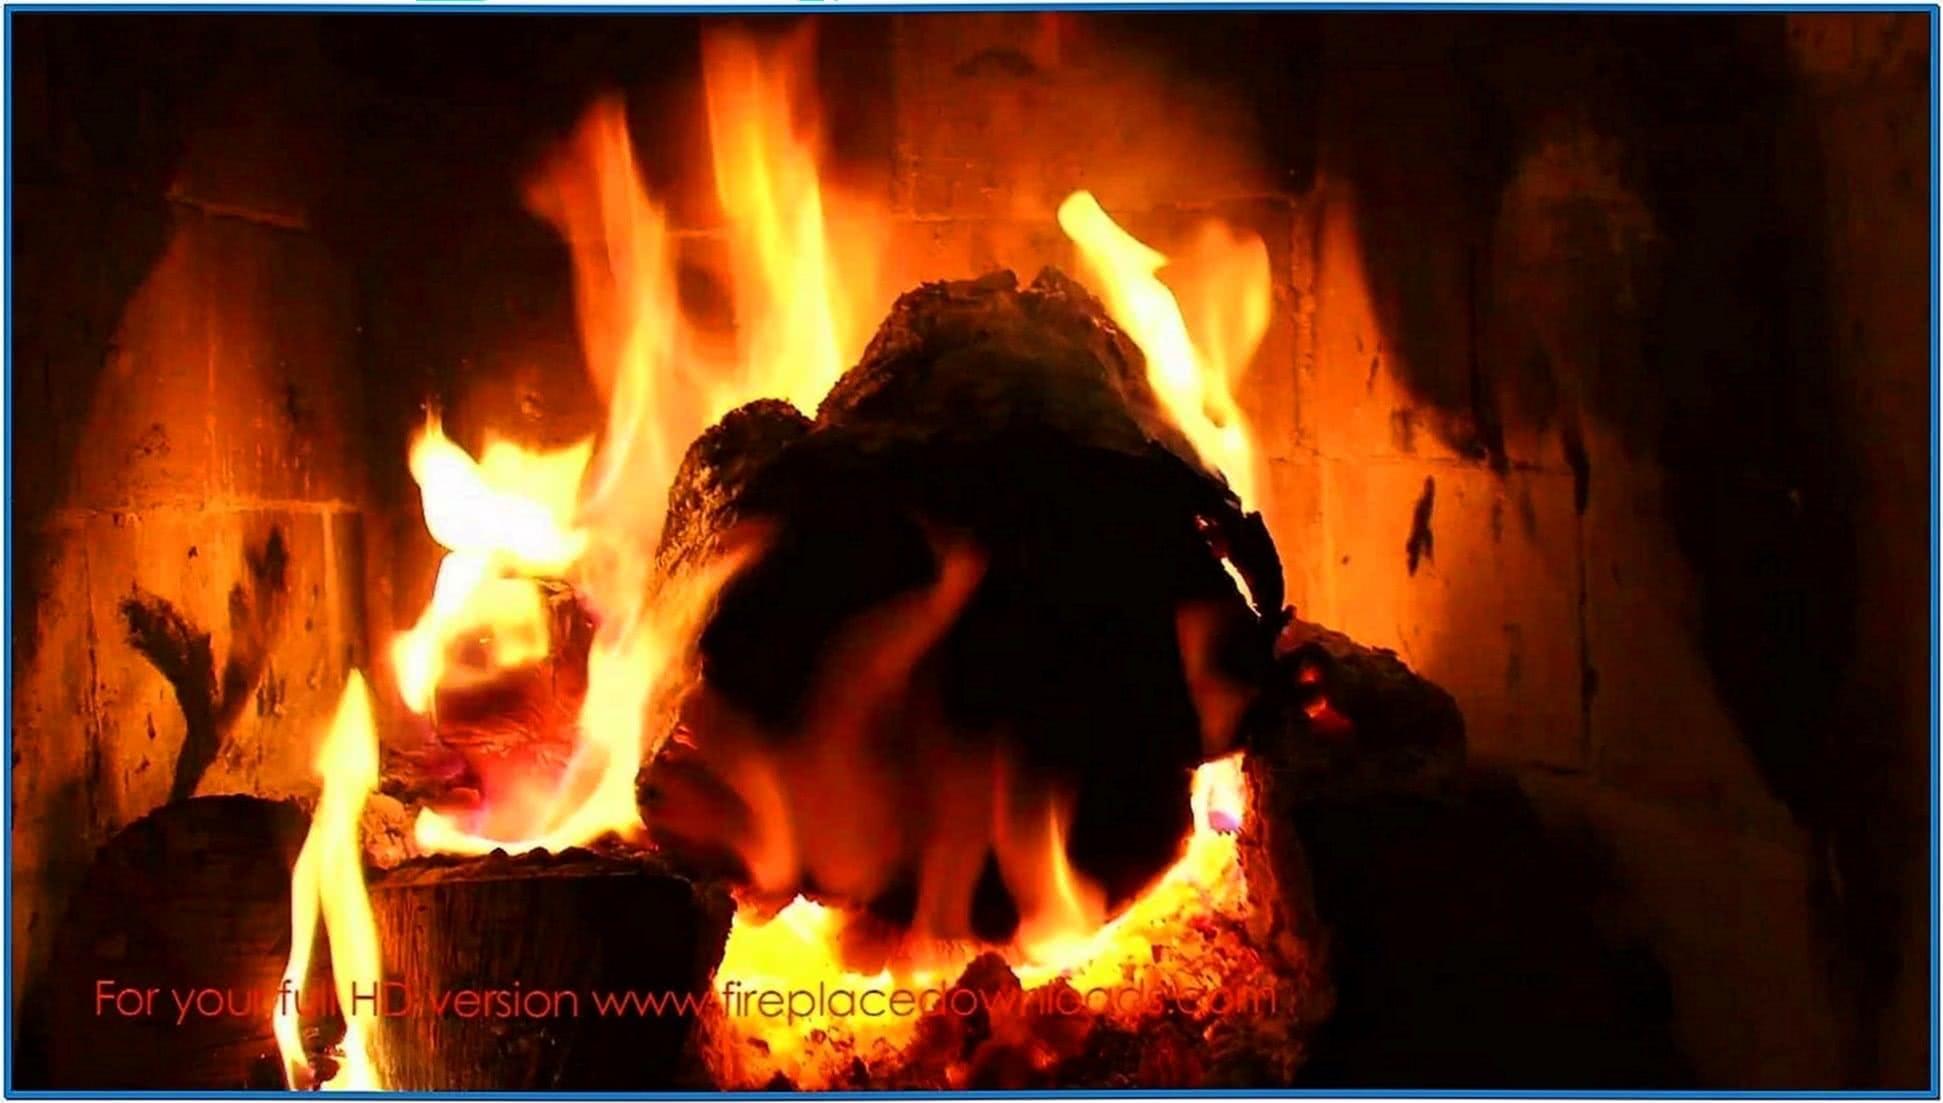 Samsung Led TV Fireplace Screensaver